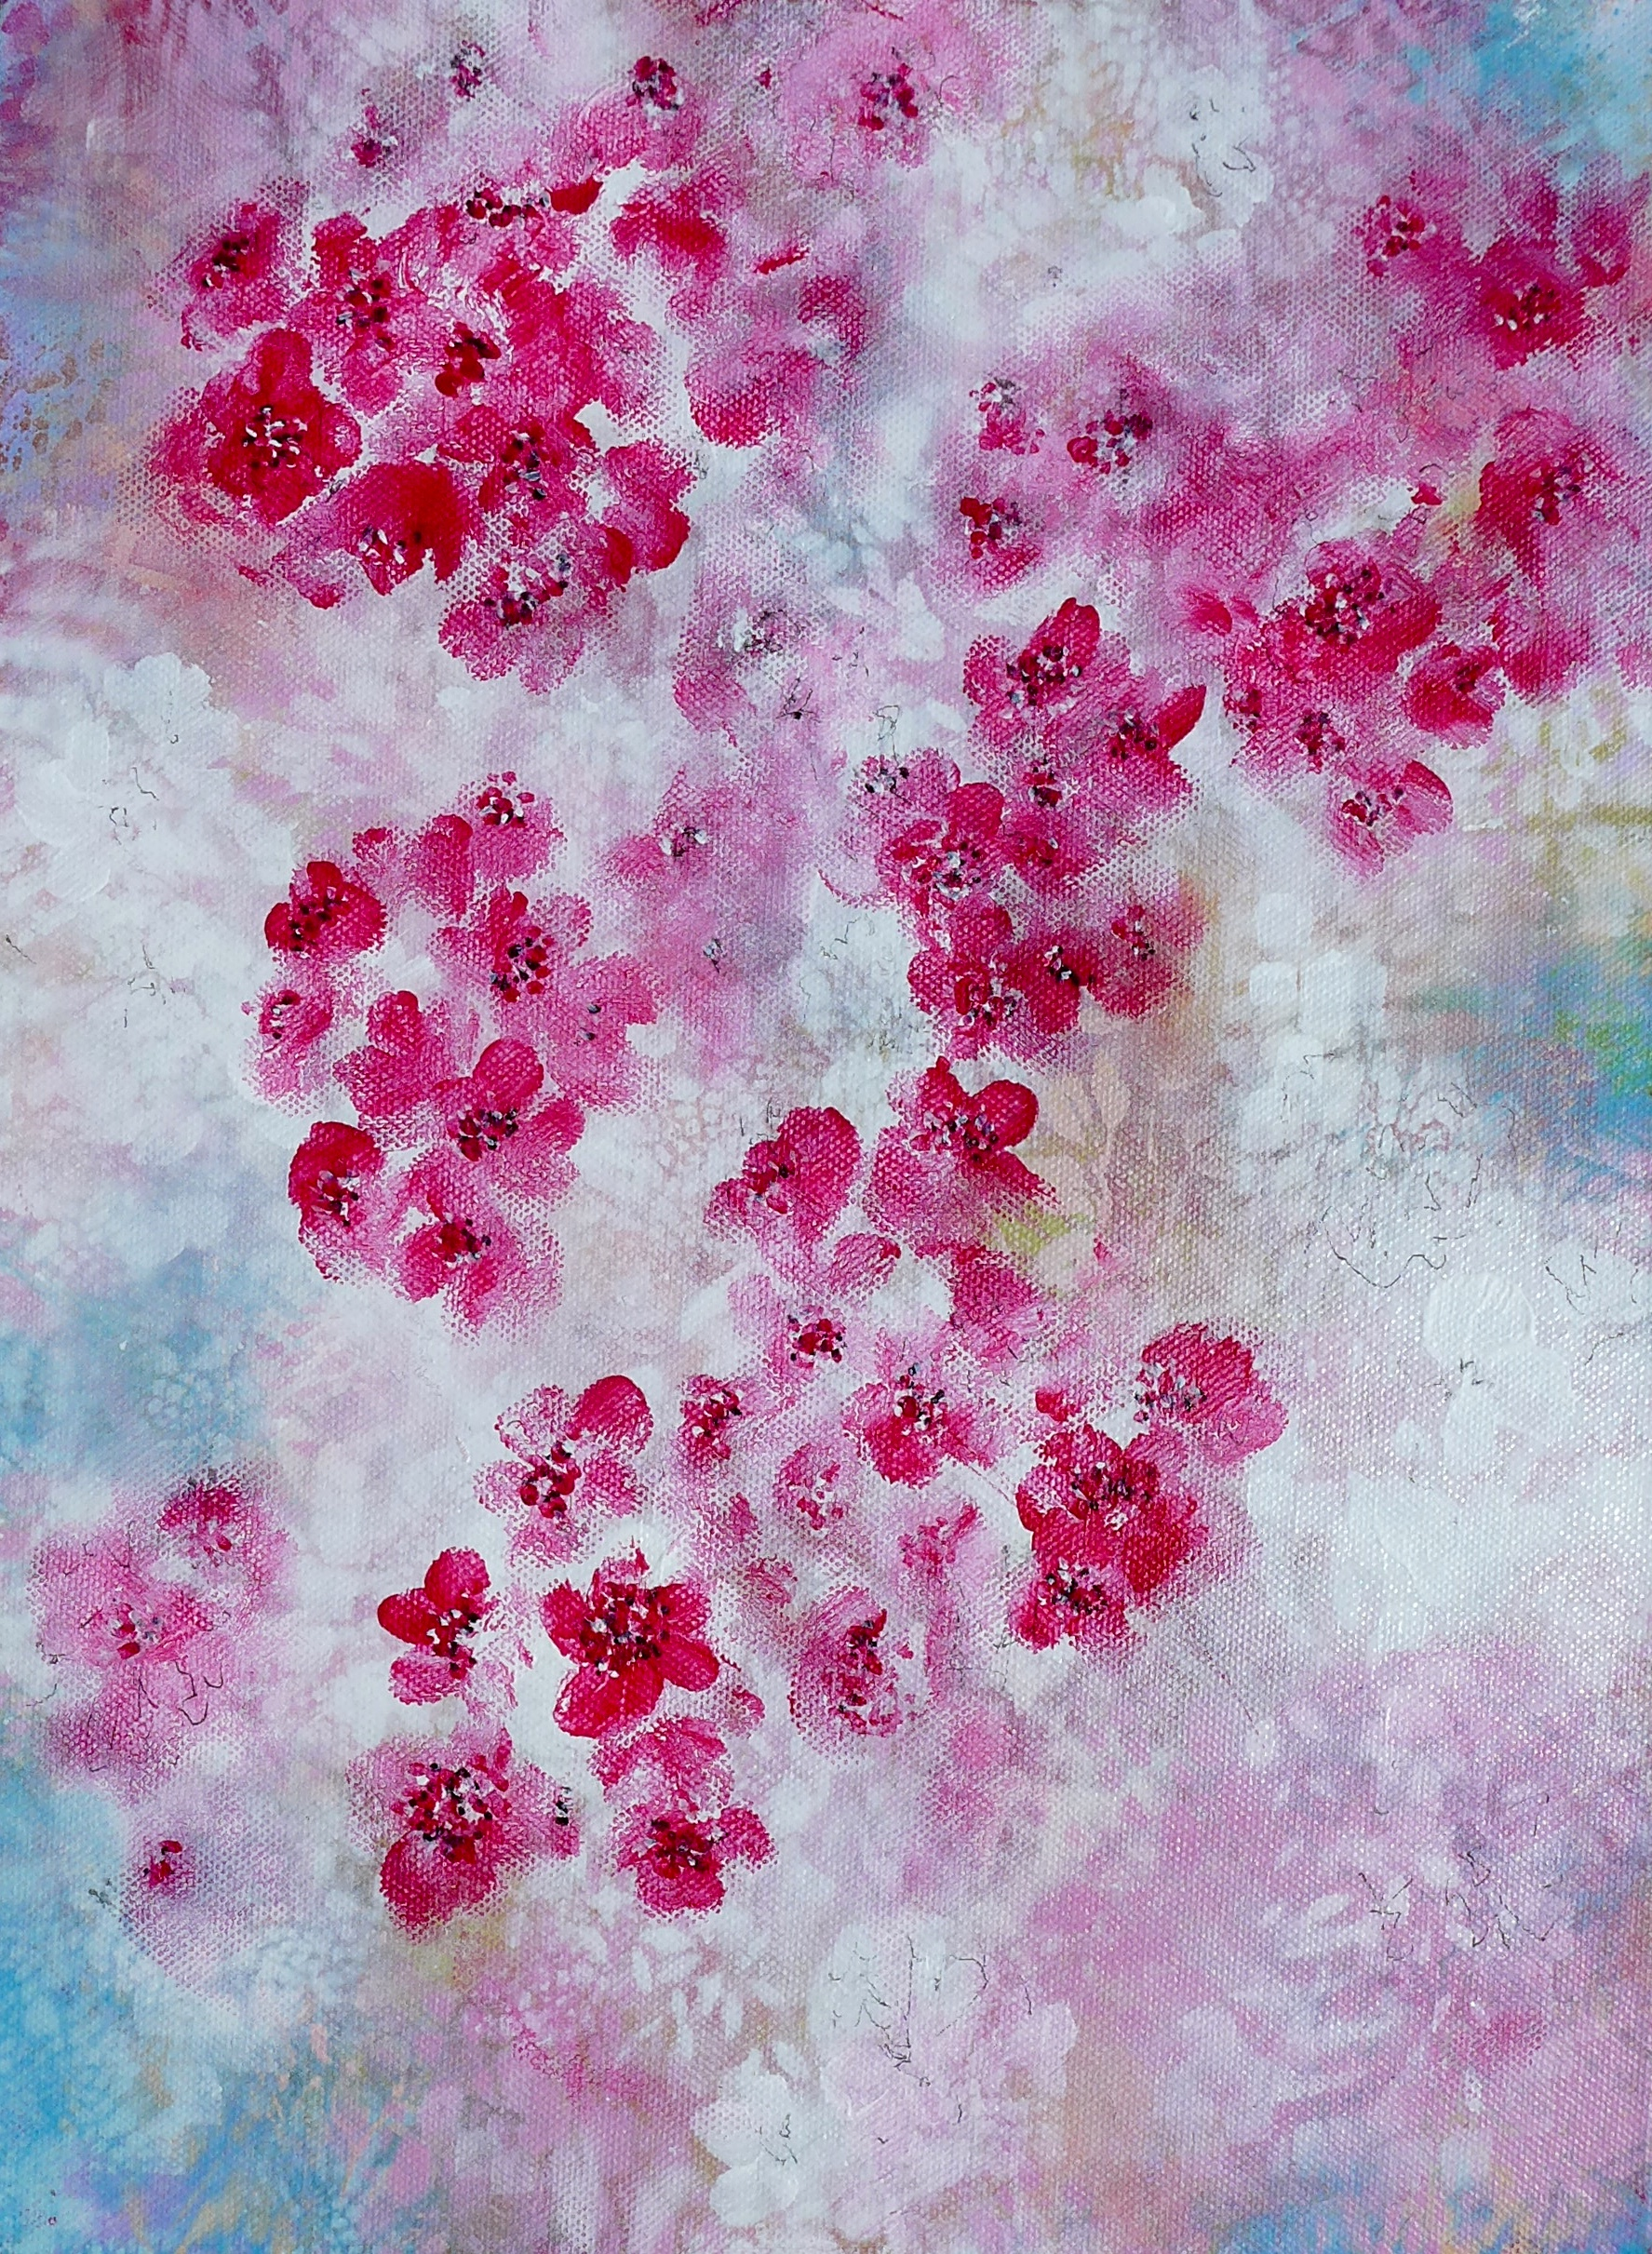 'Blossom 4' painting by Nicki MacRae.